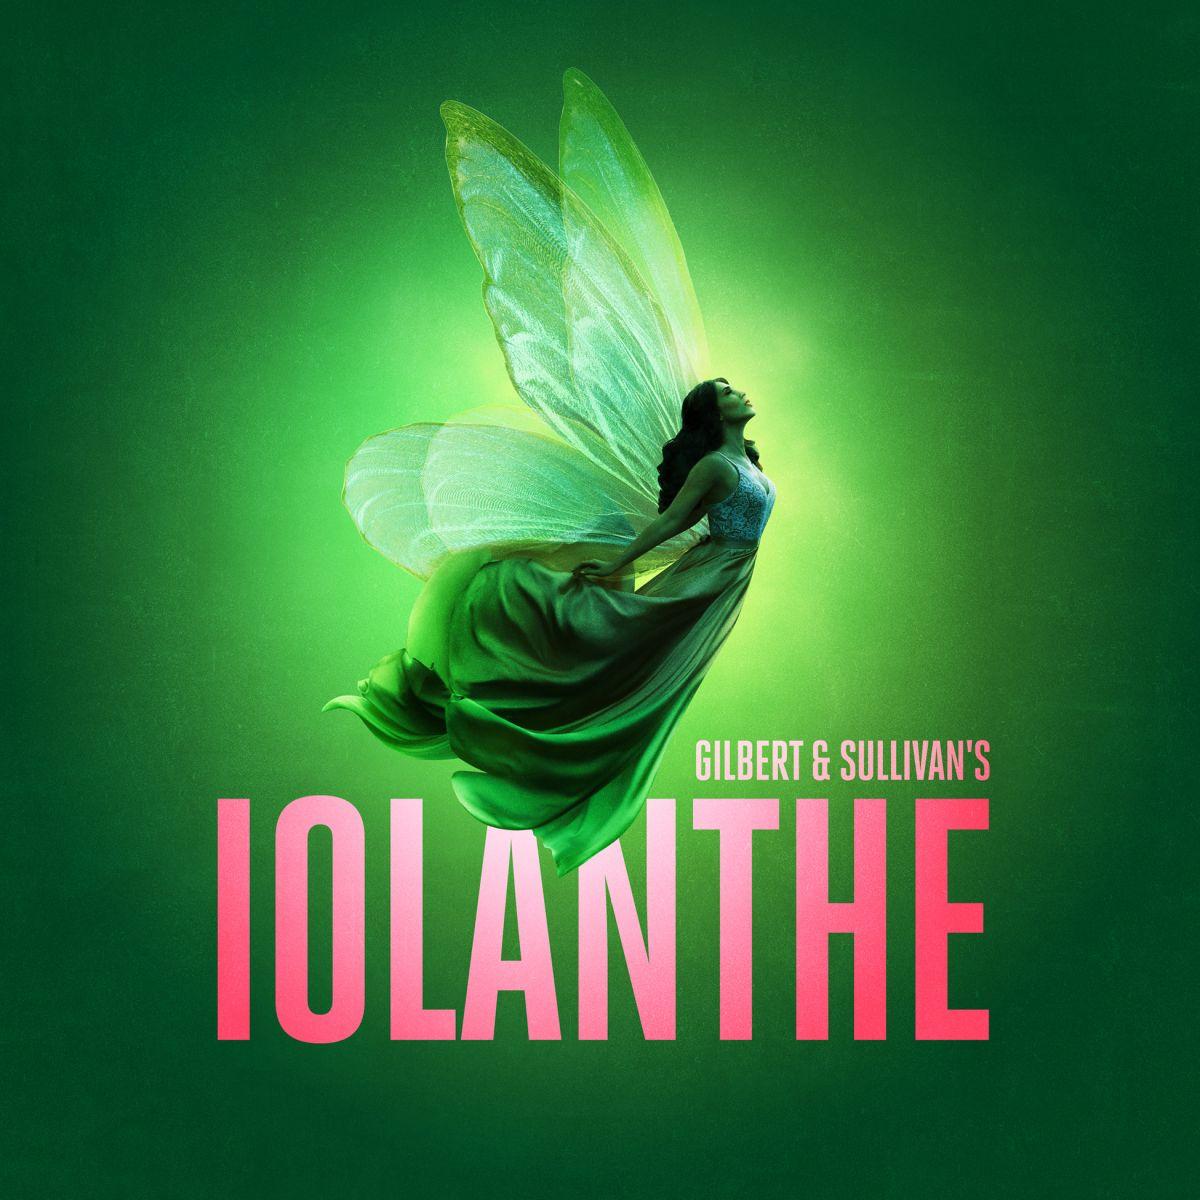 Iolanthe Cast Recording Now On Sale